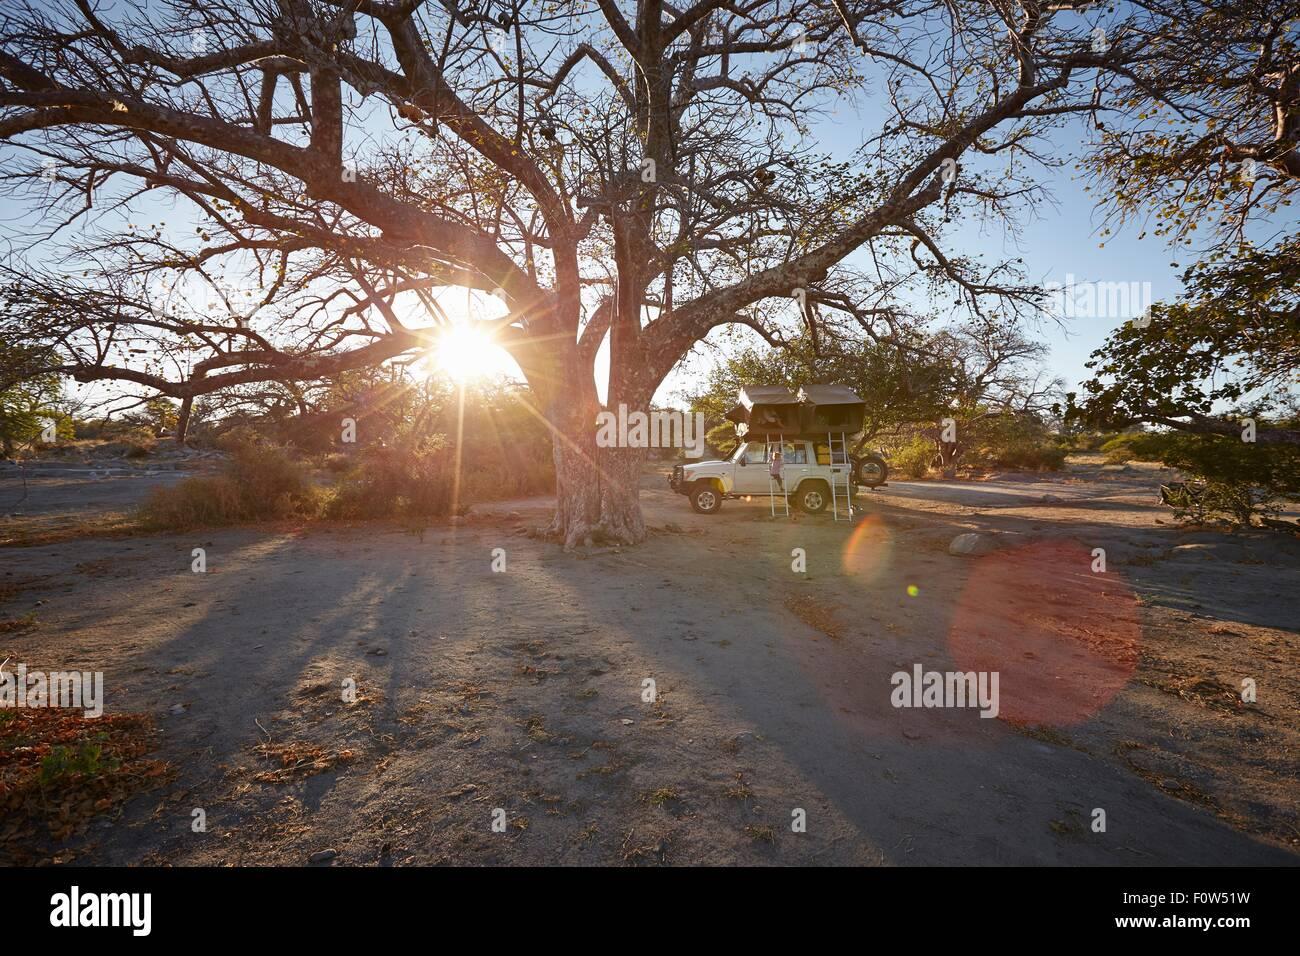 Off-Road Fahrzeug geparkt vom Großbaum, Sonnenuntergang, Gweta, Makgadikgadi, Botswana Stockbild